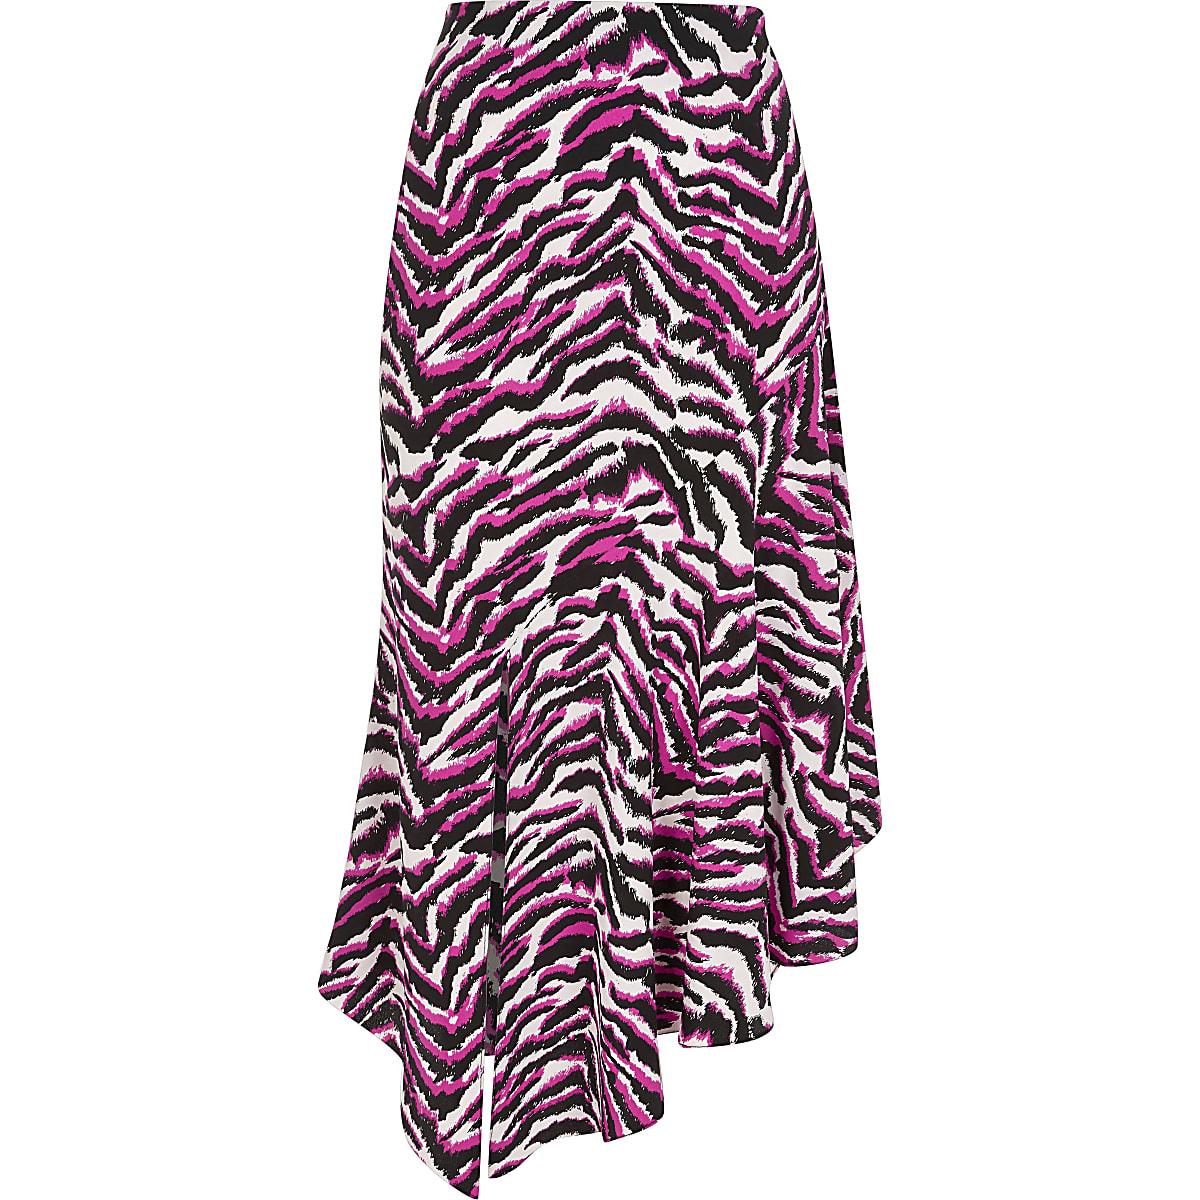 f4ee181a04 Pink zebra print asymmetric midi skirt - Midi Skirts - Skirts - women